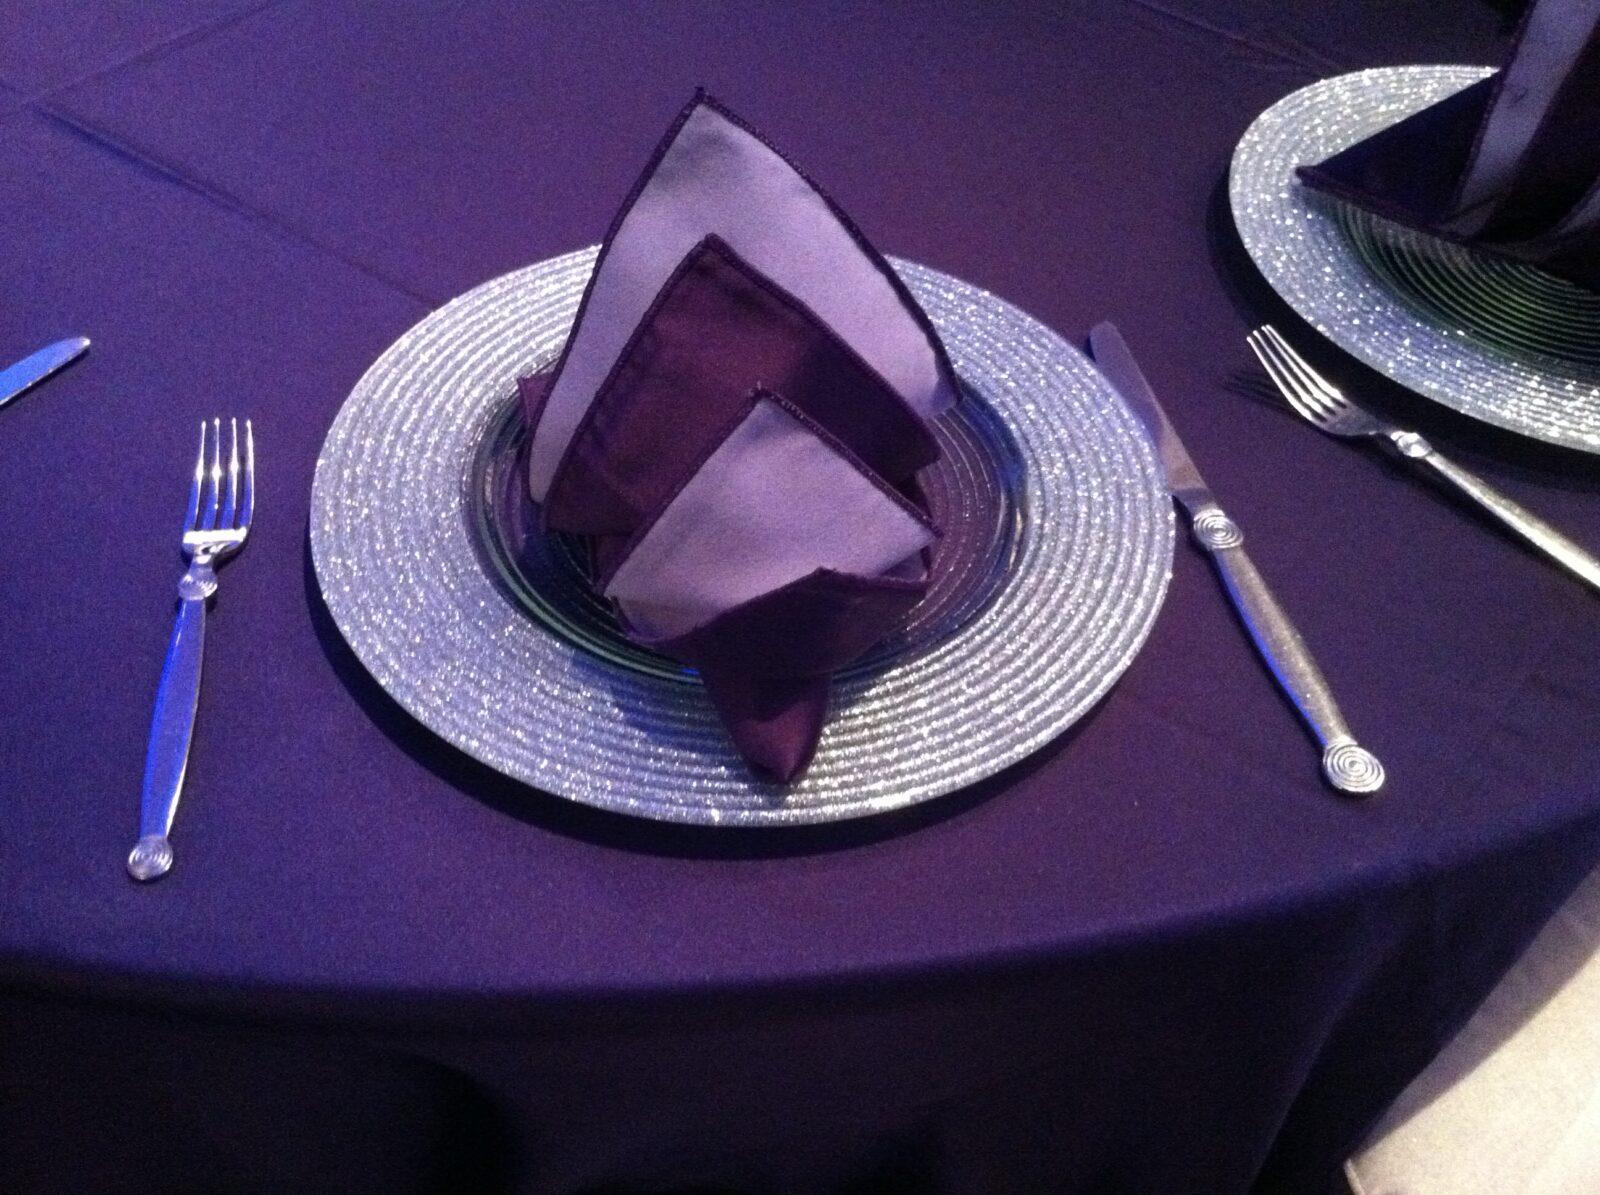 Blue Spark Event Design - Purple satin linen - Silver charter, Purple Satin Napkin